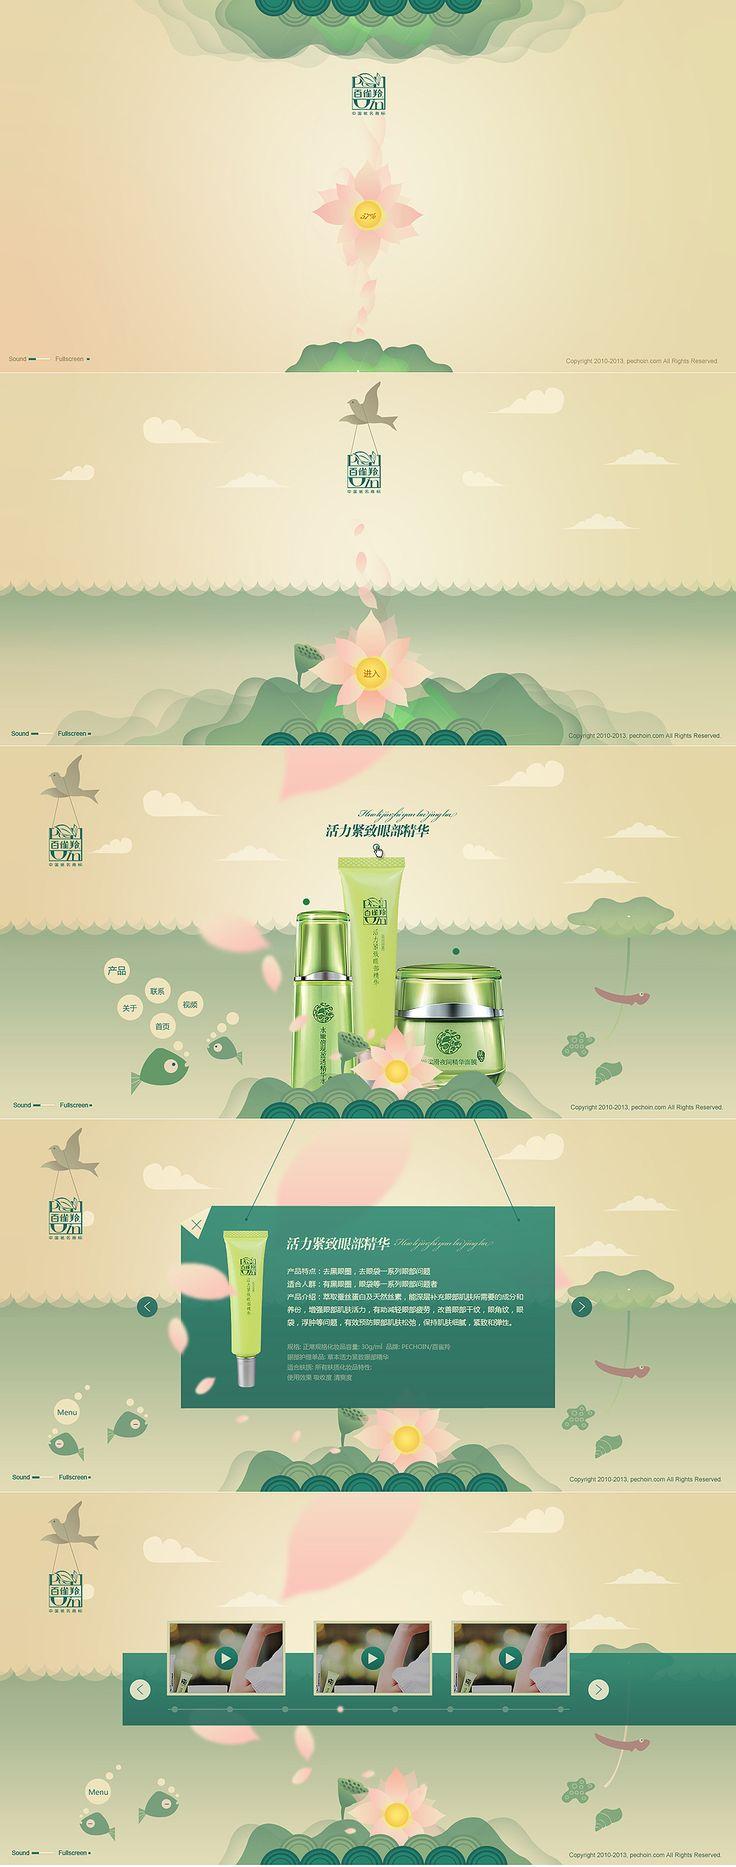 Pechoin-cosmetics(summer style) by sense983.deviantart.com on @deviantART